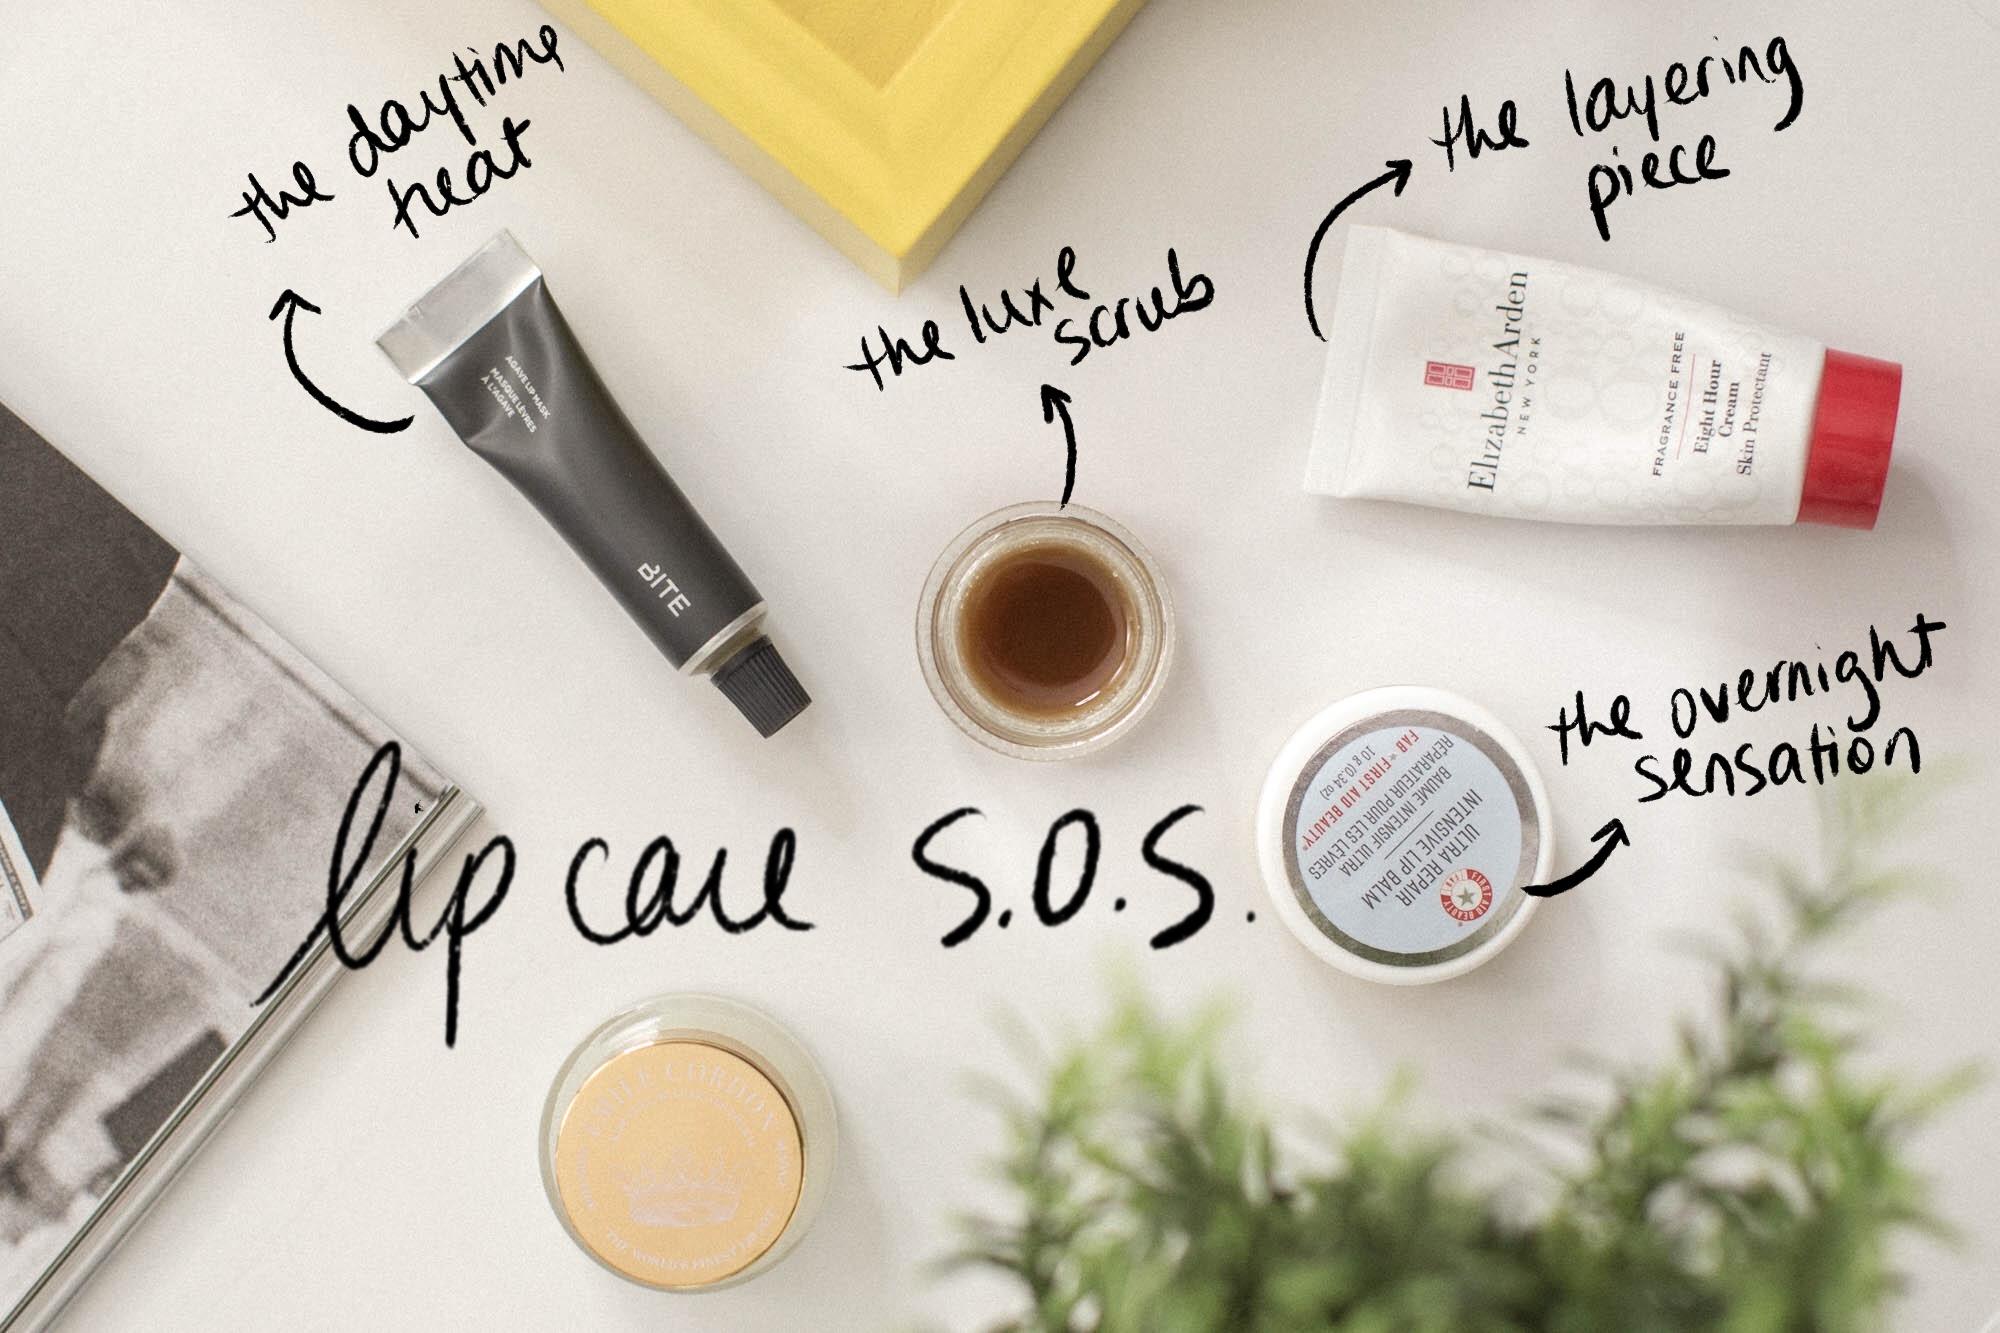 winter_lip_care_essentials.jpg